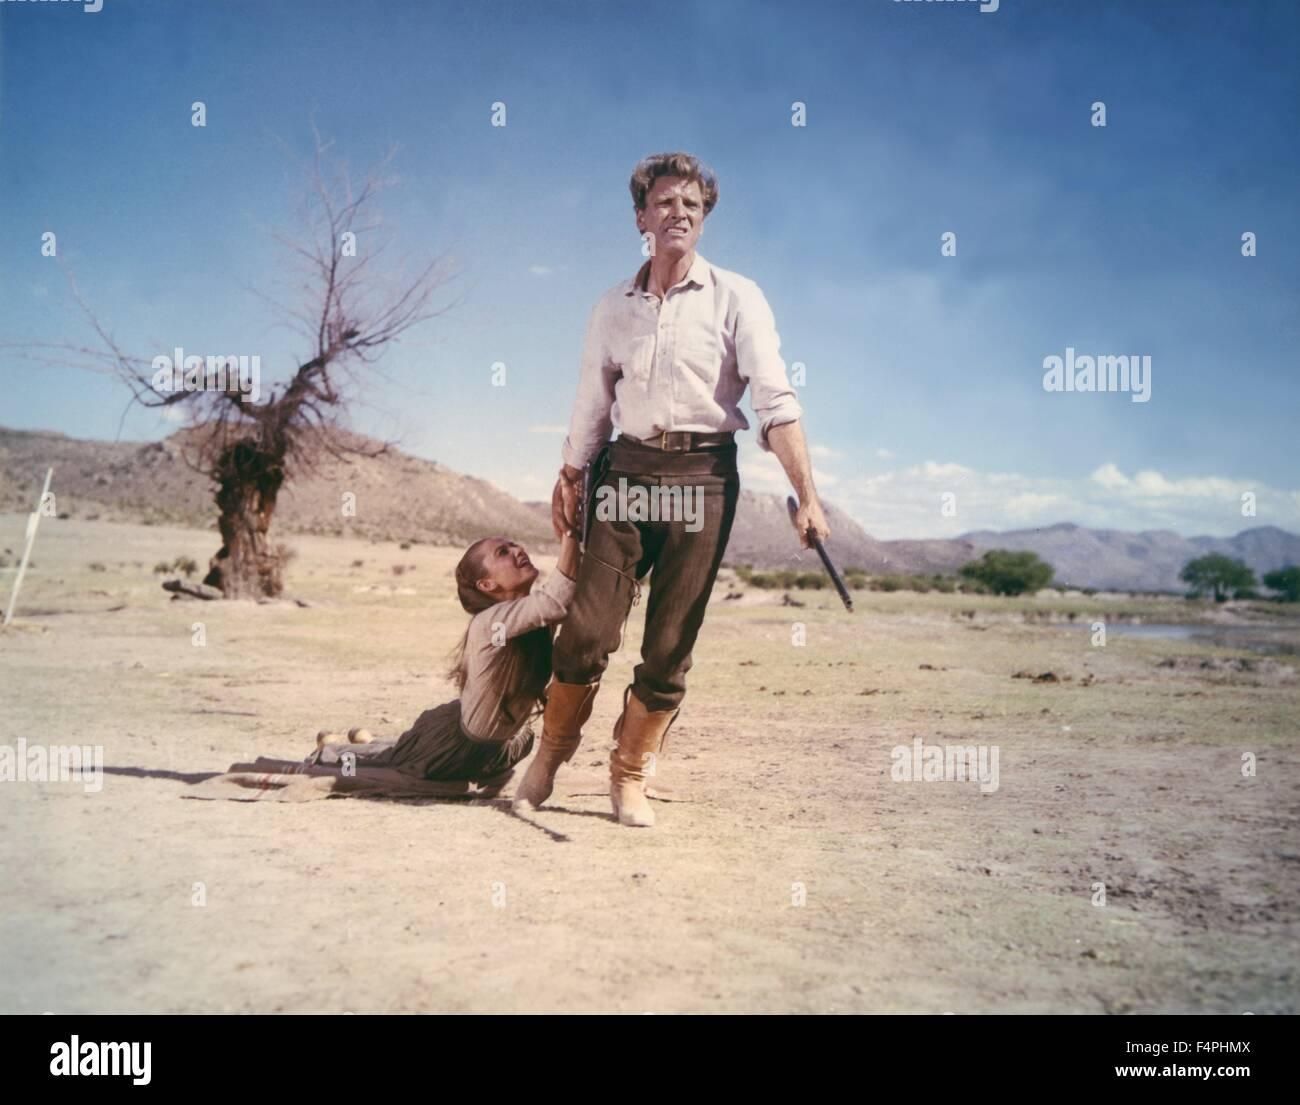 Burt Lancaster and Audrey Hepburn / The unforgiven / 1960 directed by John Huston [United Artists] - Stock Image